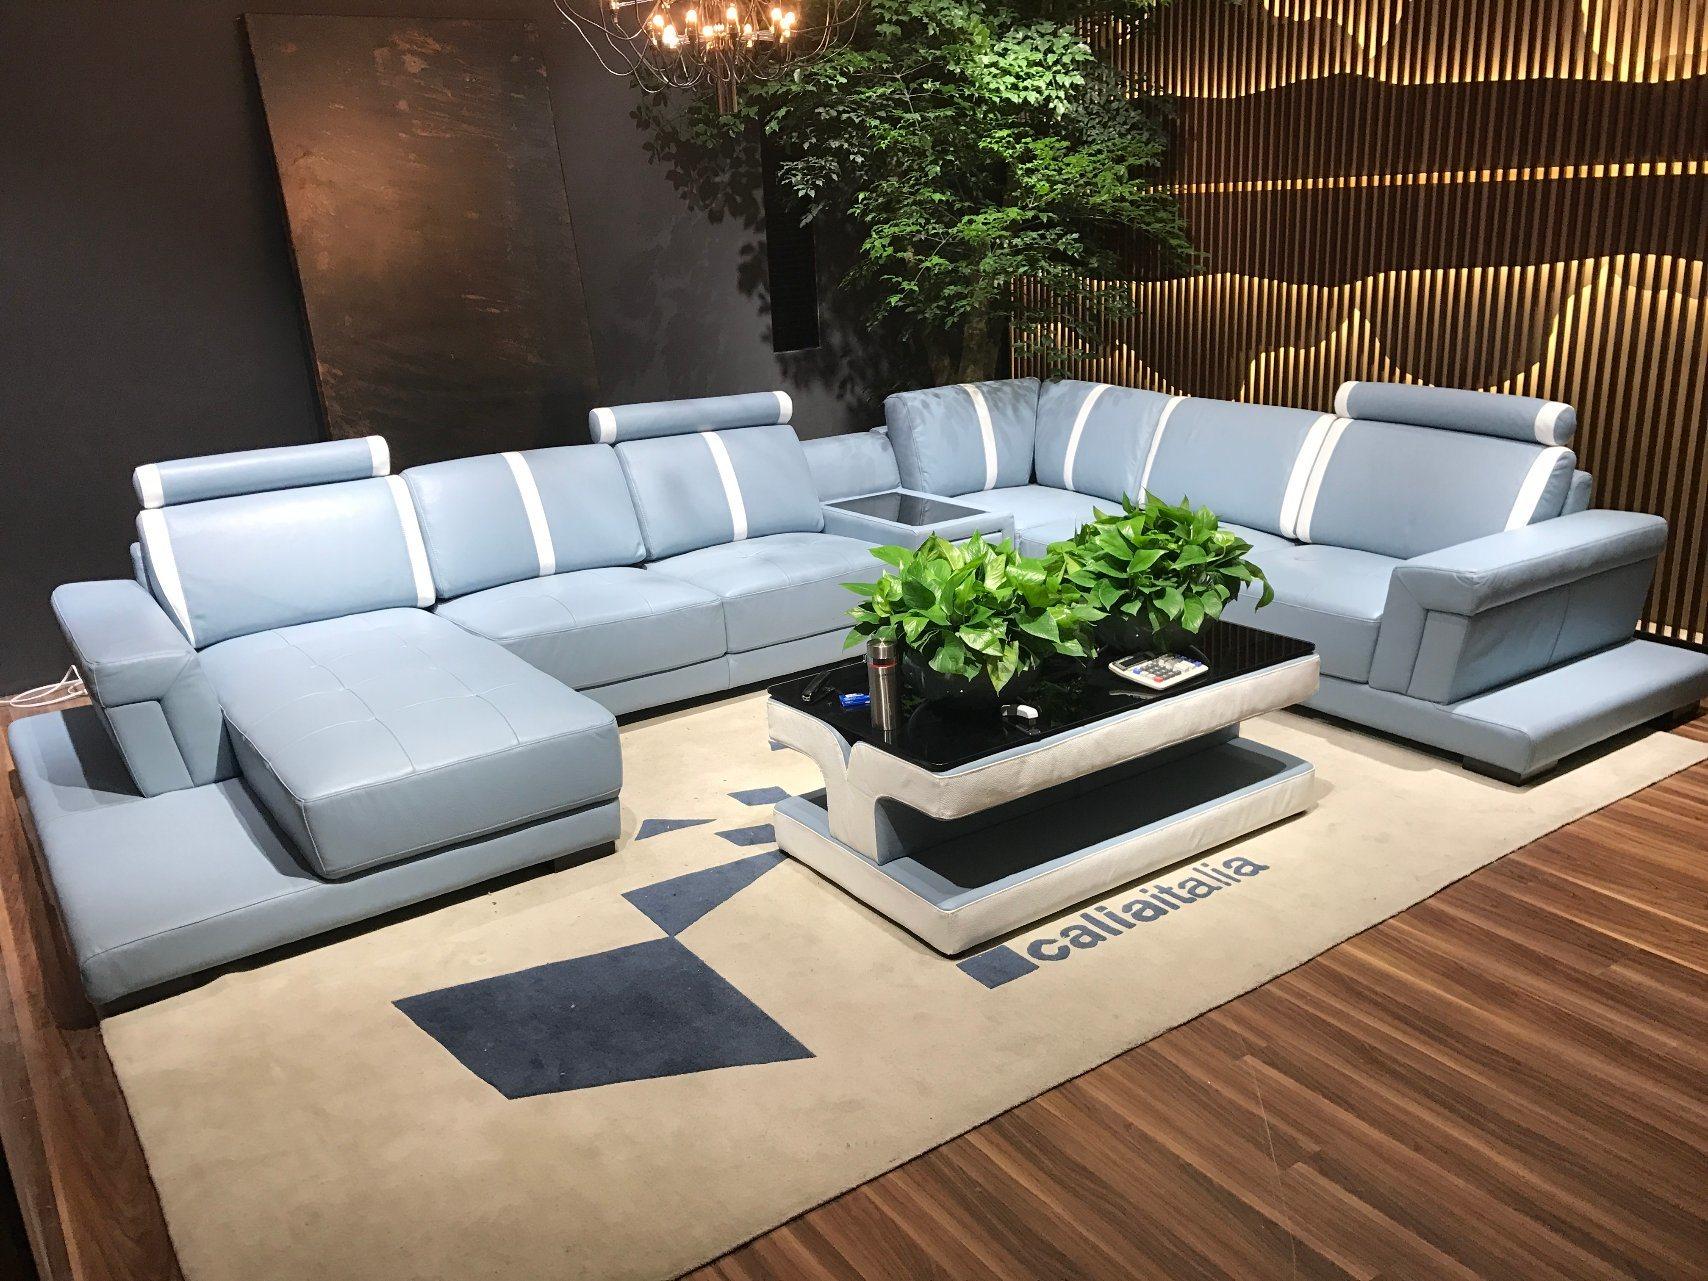 Moderno Moderna Sala De Estar Muebles De Reino Unido Molde - Muebles ...